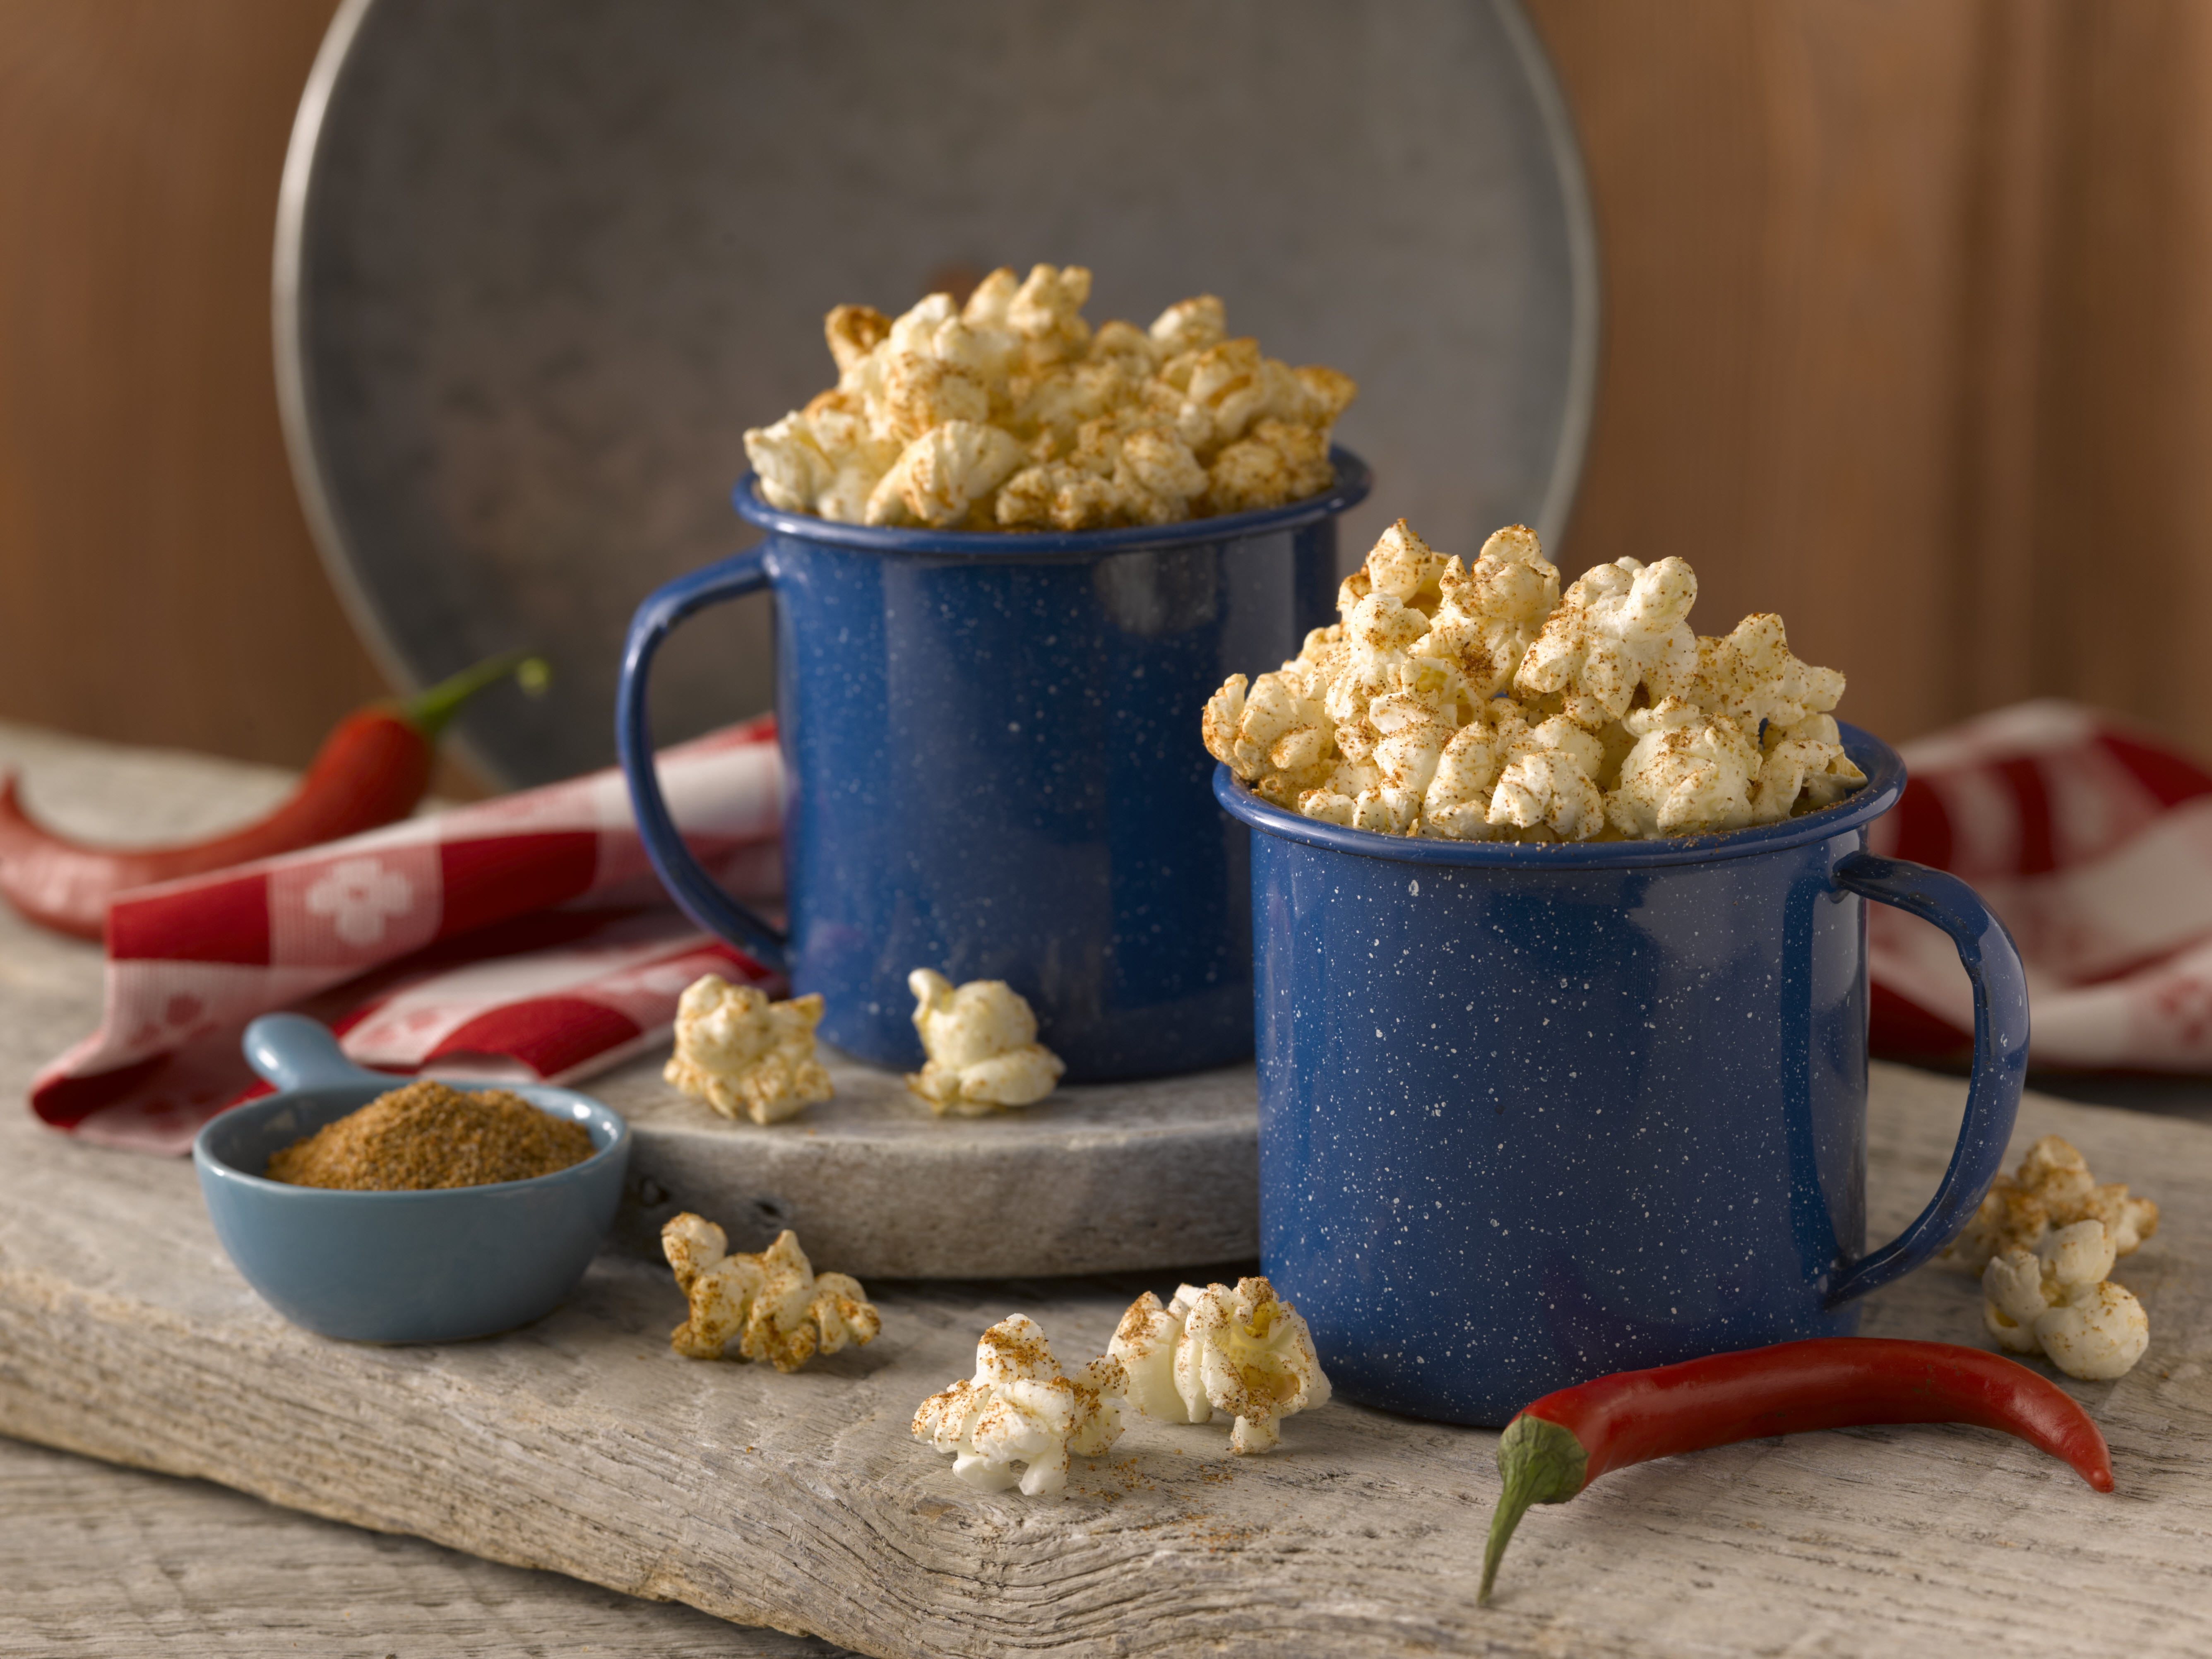 Snacks • Water Gardens Popcorn